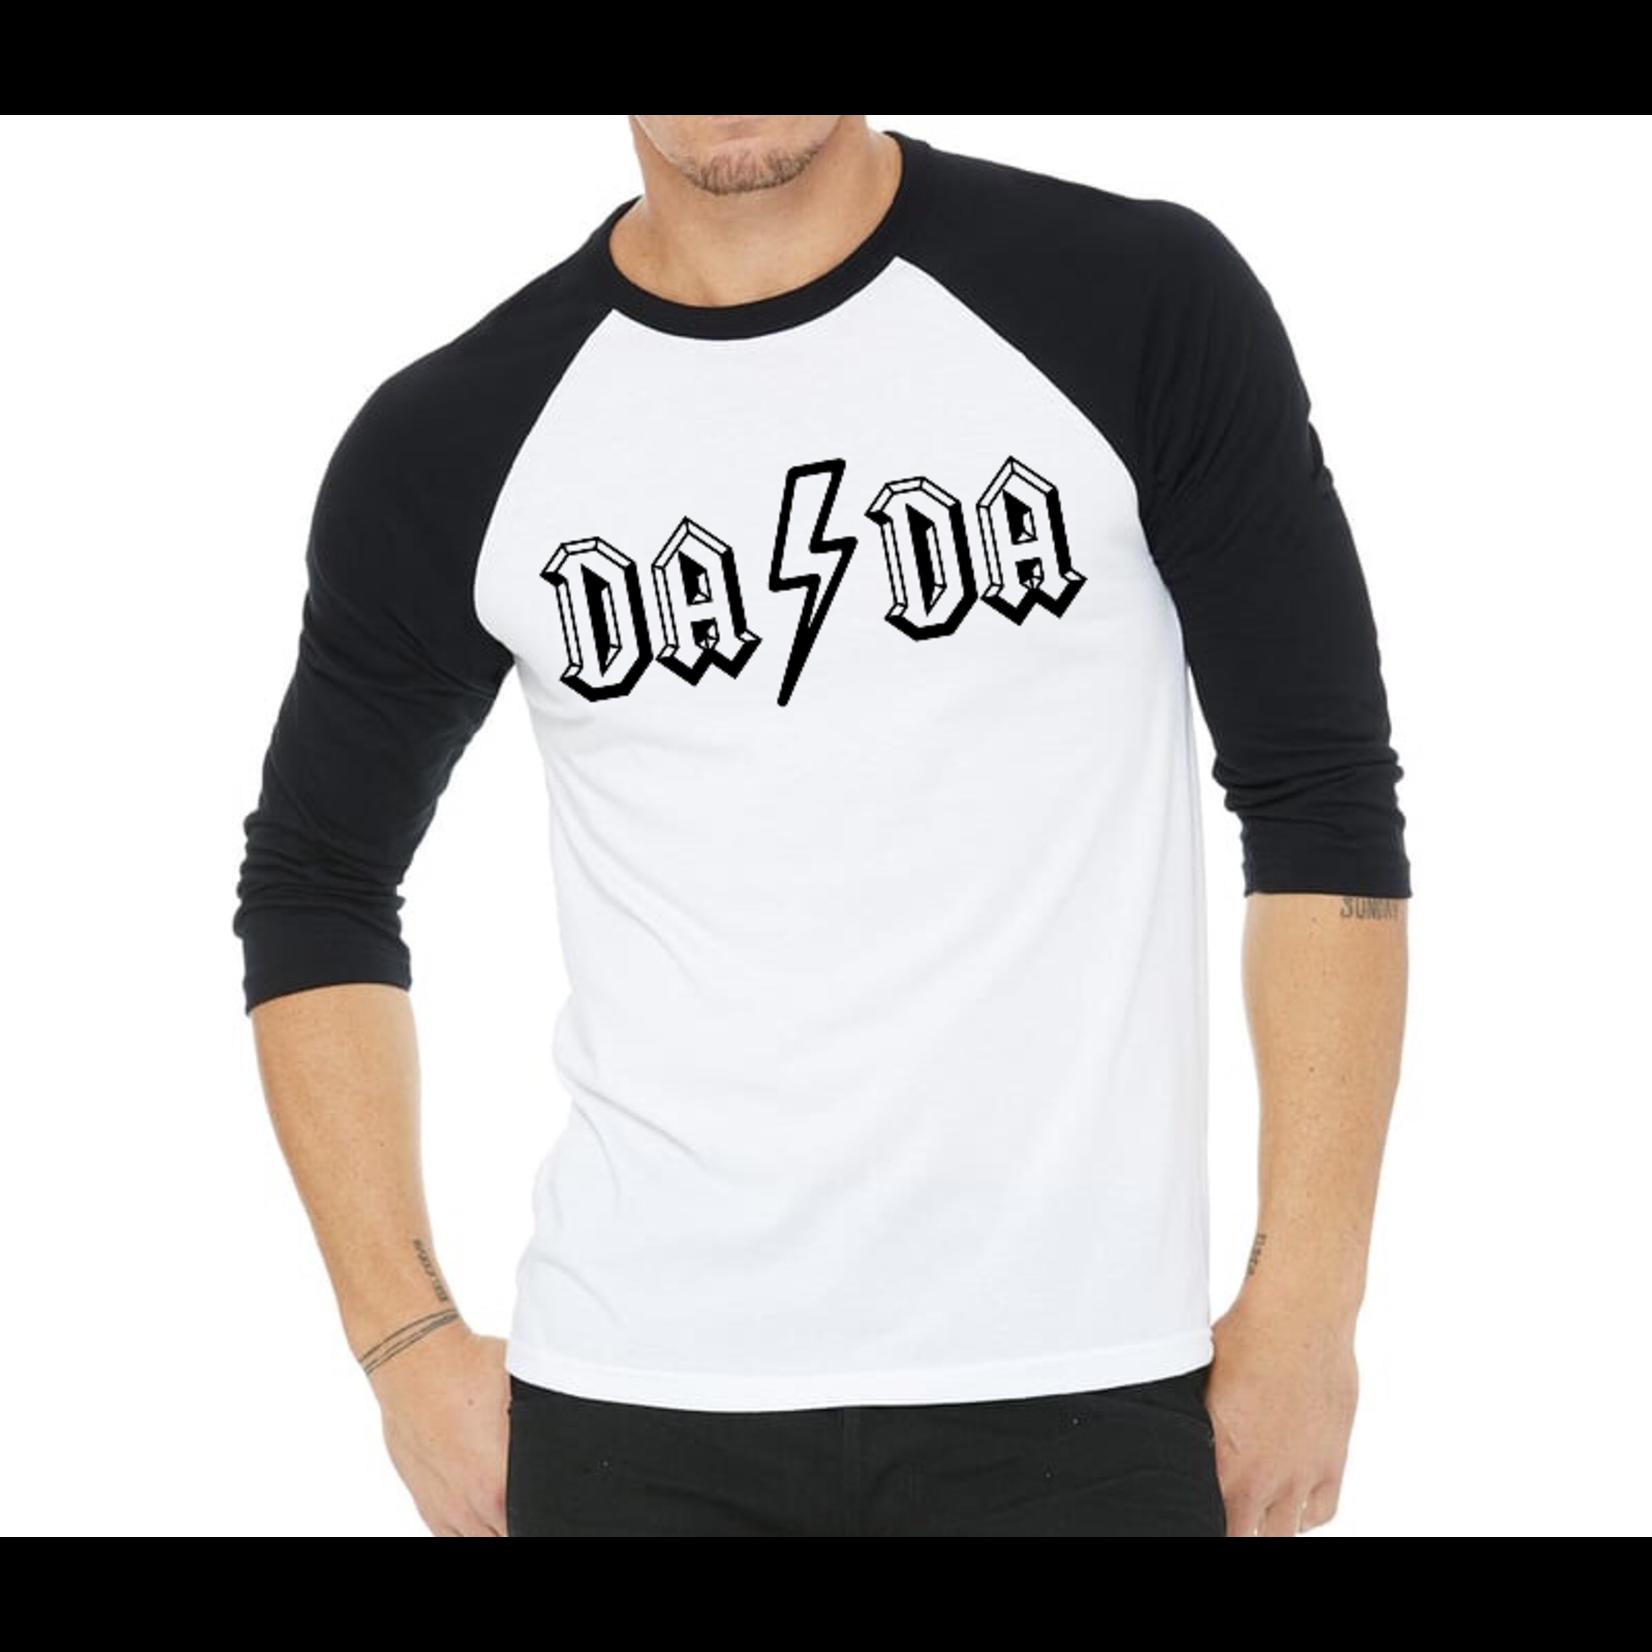 favourite things apparel Dada Baseball tee